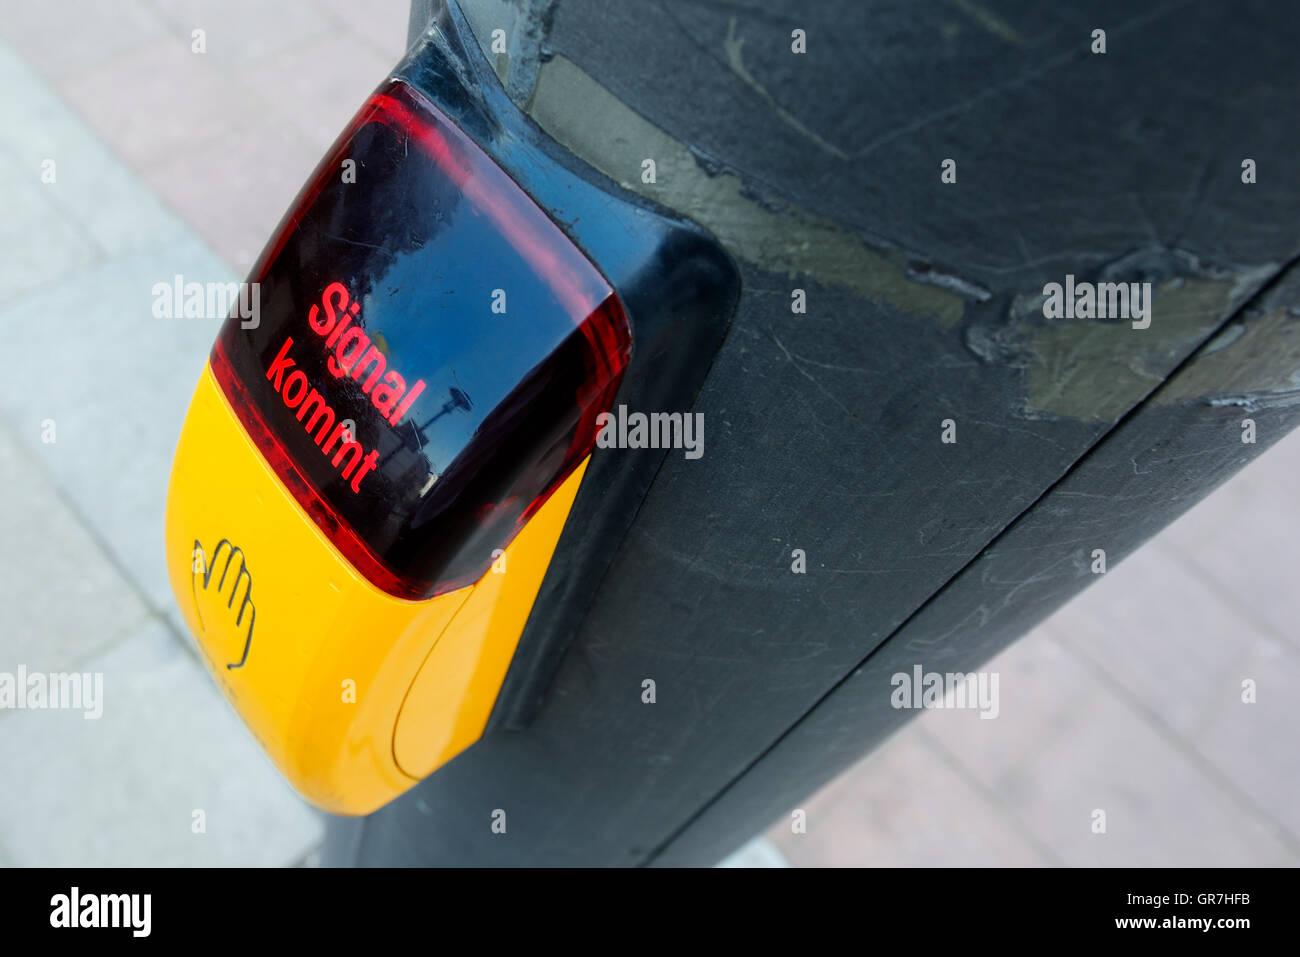 Product Key Stockfotos & Product Key Bilder - Alamy